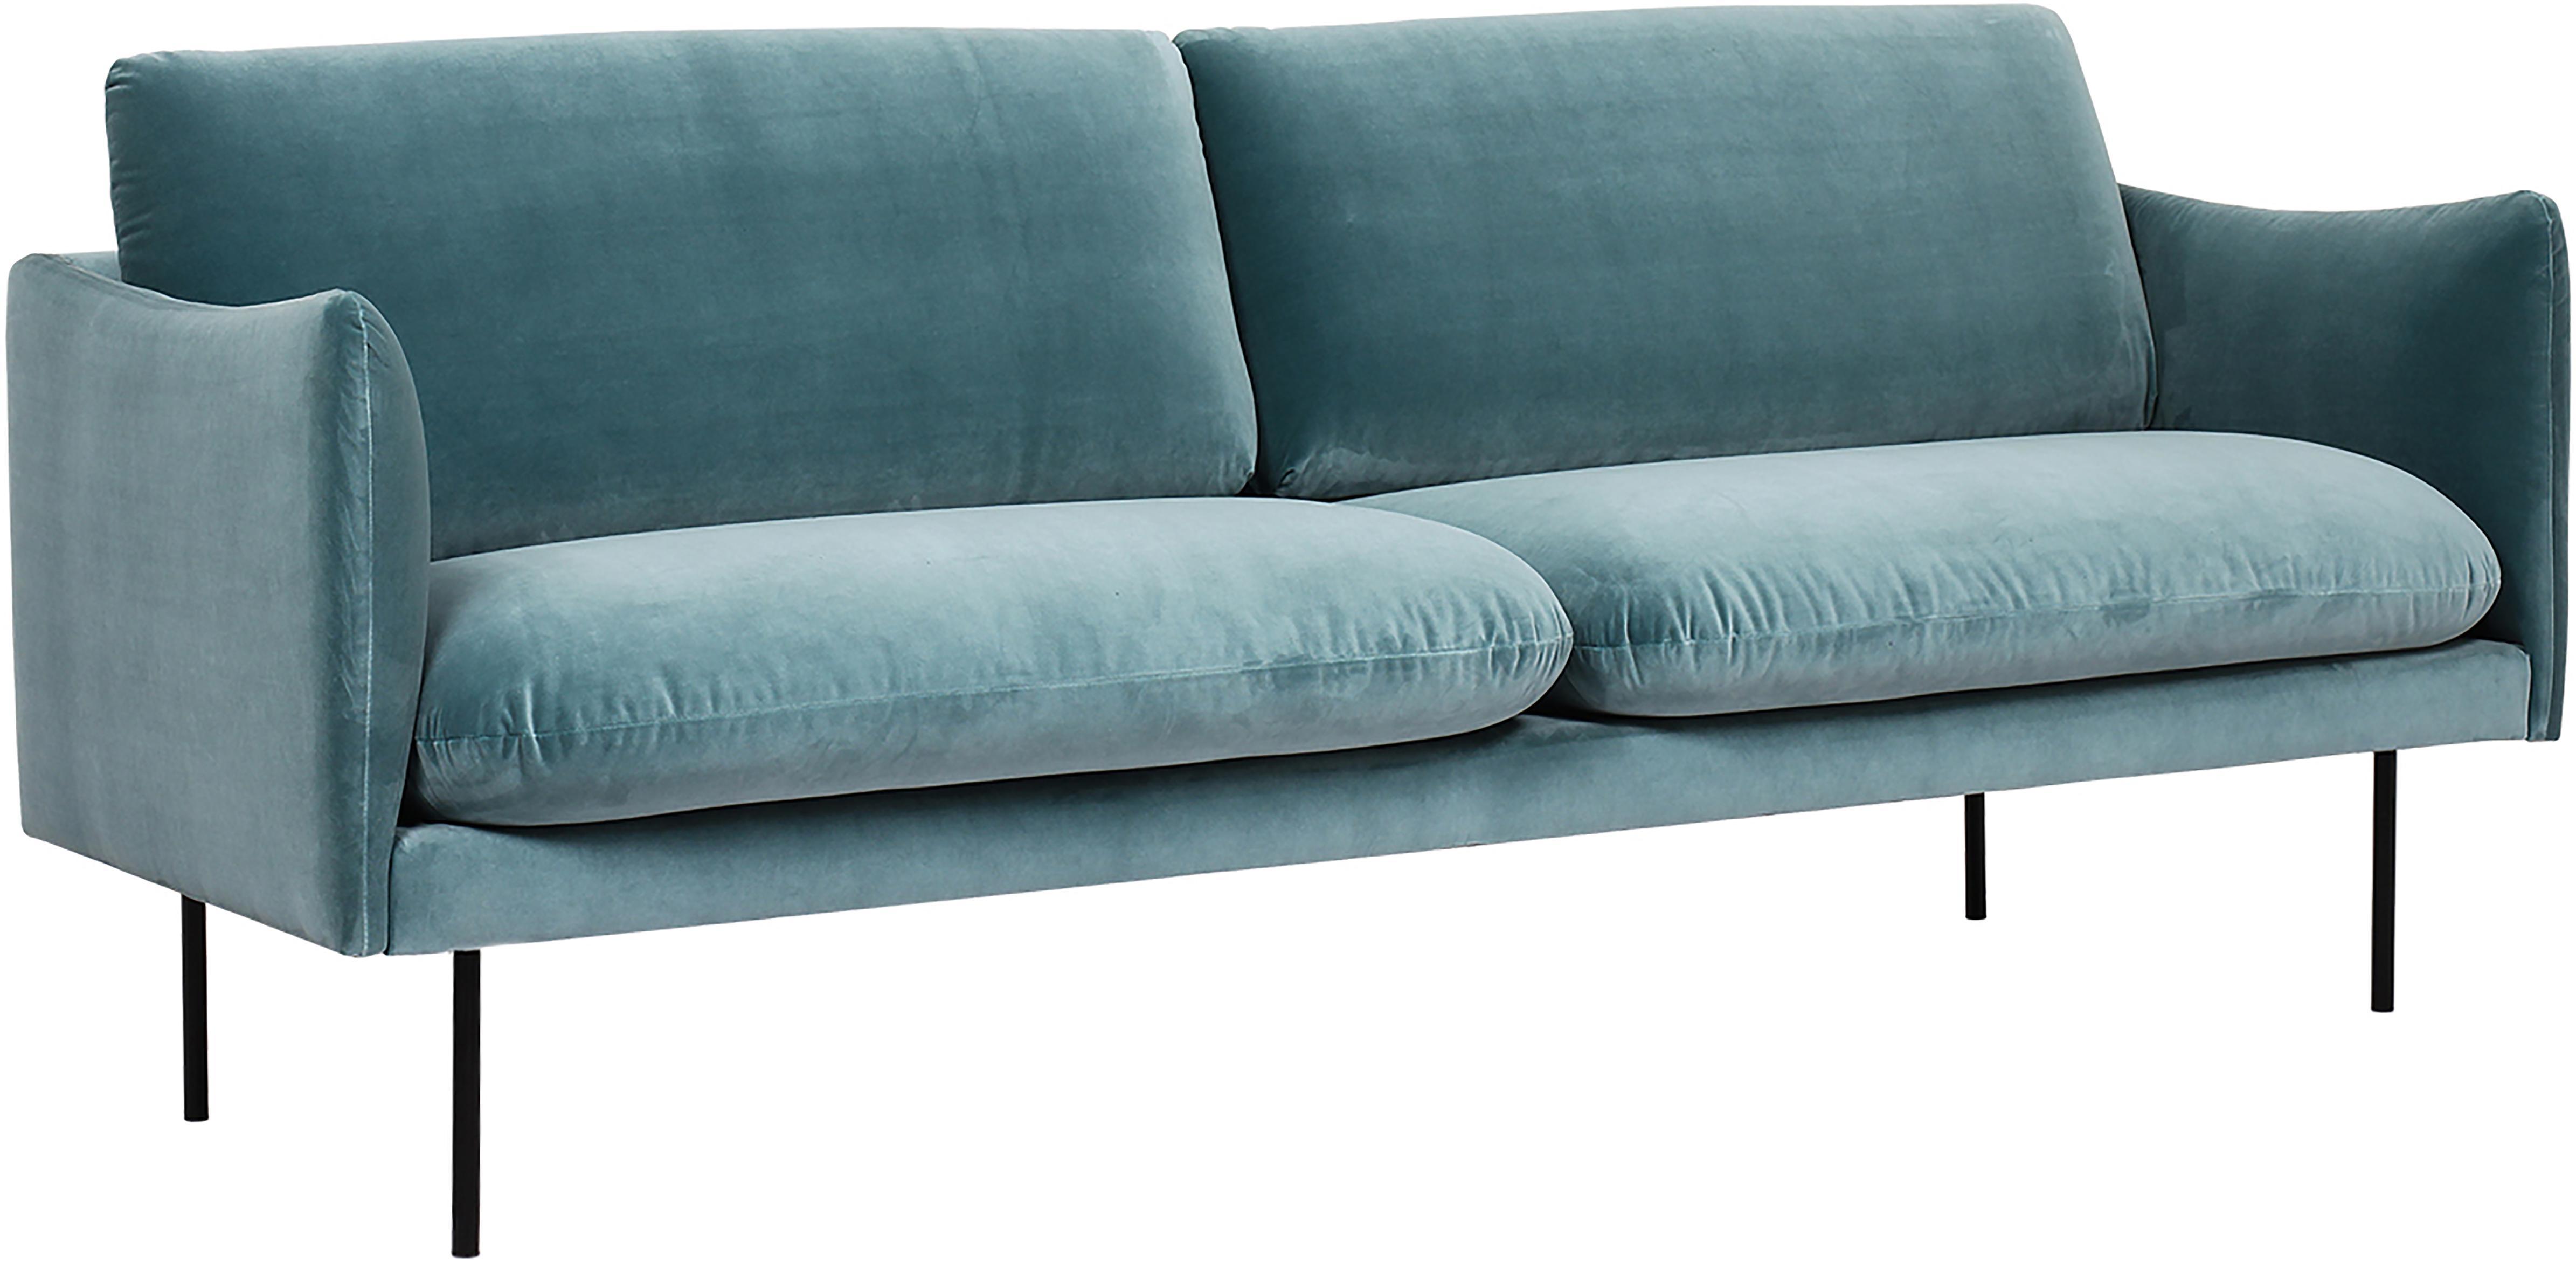 Samt-Sofa Moby (2-Sitzer), Bezug: Samt (Hochwertiger Polyes, Gestell: Massives Kiefernholz, Füße: Metall, pulverbeschichtet, Samt Türkis, B 170 x T 95 cm